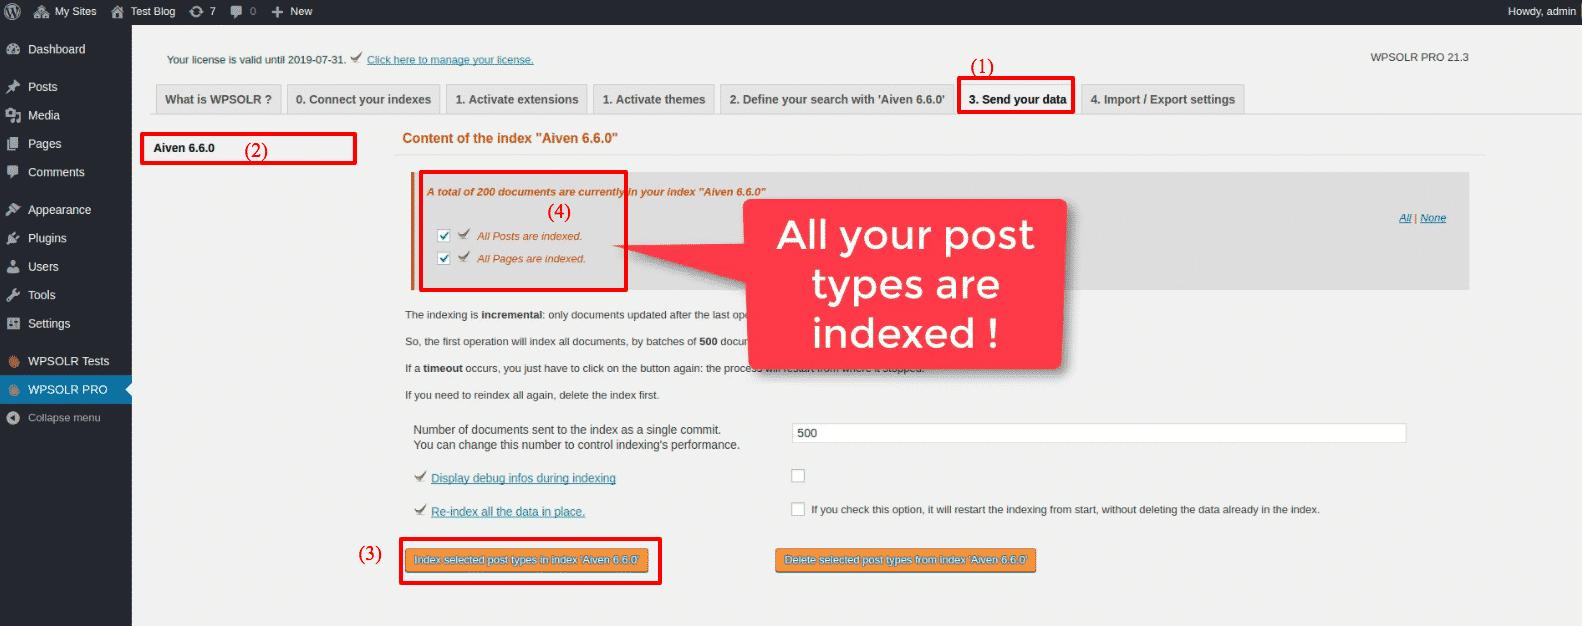 Aiven Elasticsearch: new index indexed